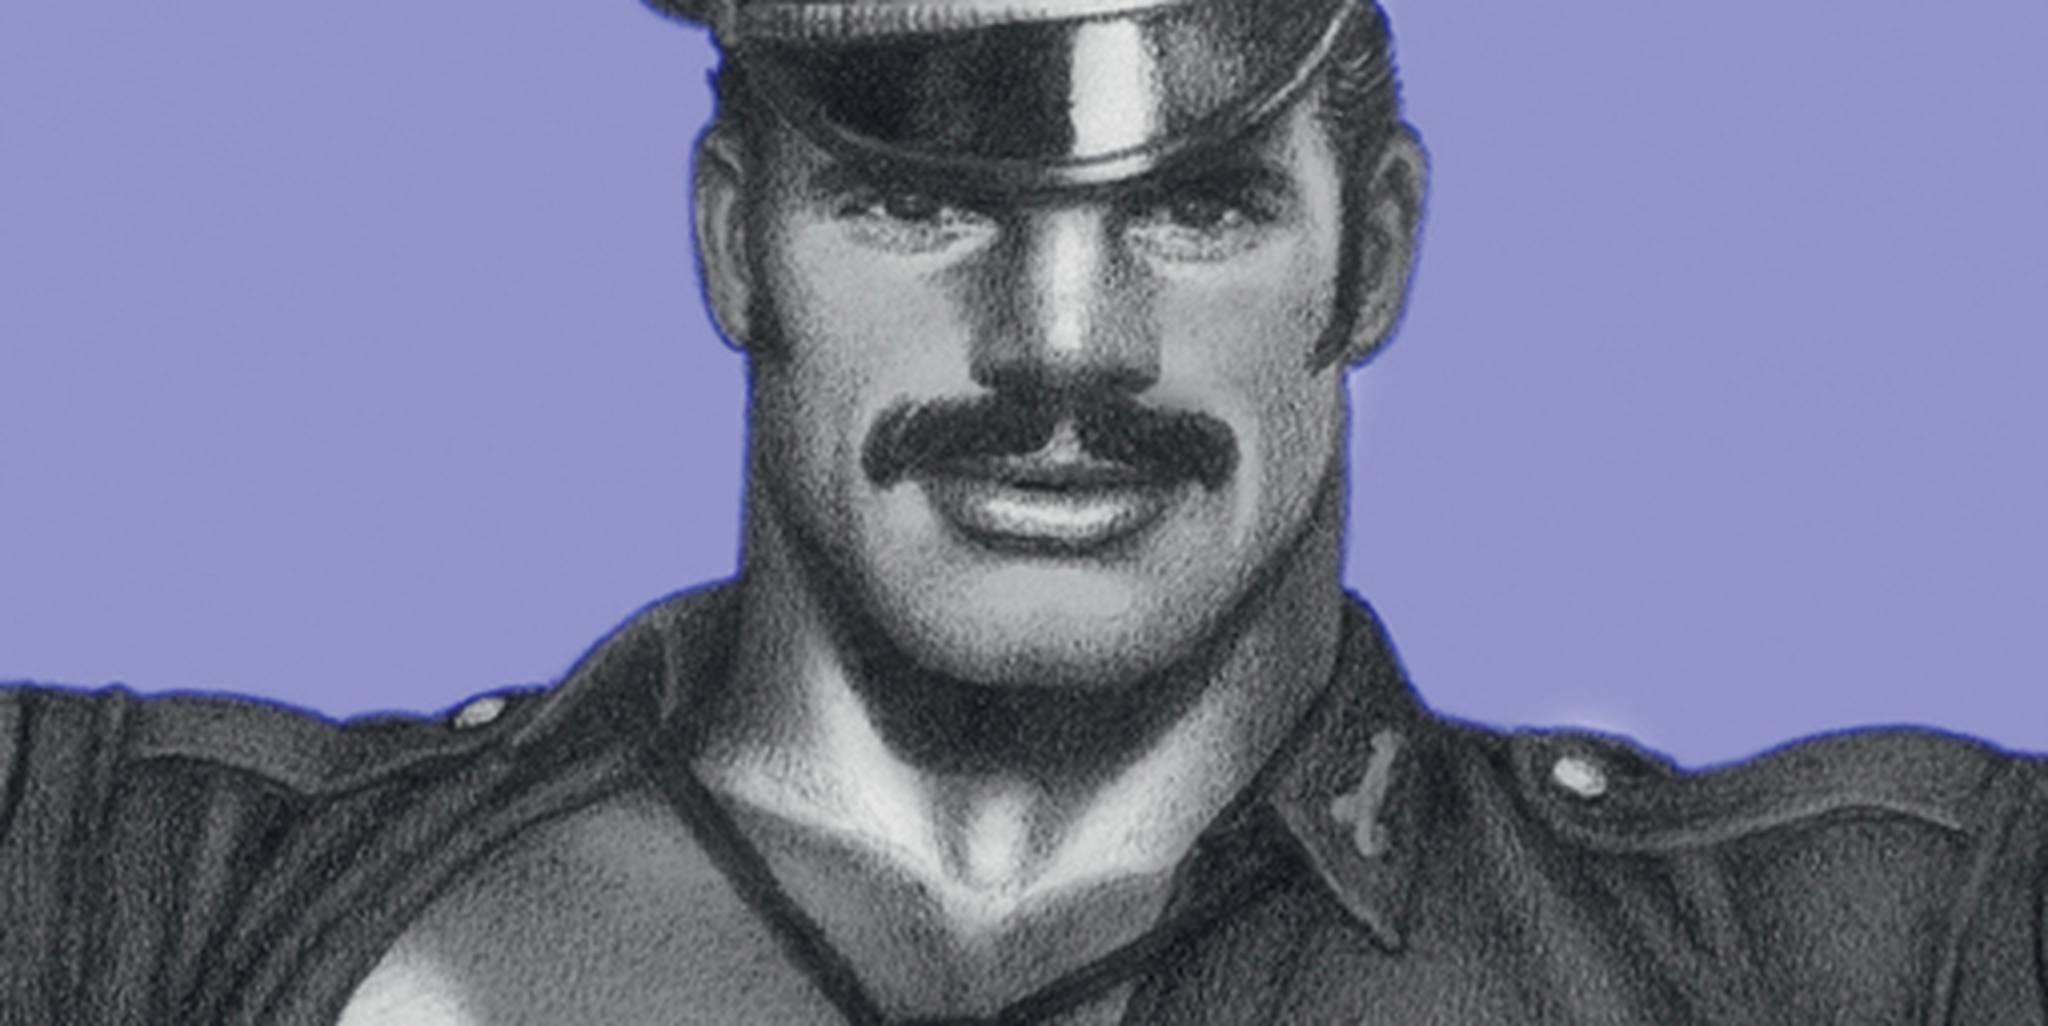 Tom-of-Finland_bio_cover.jpg (JPEG Image, 511×678 pixels)